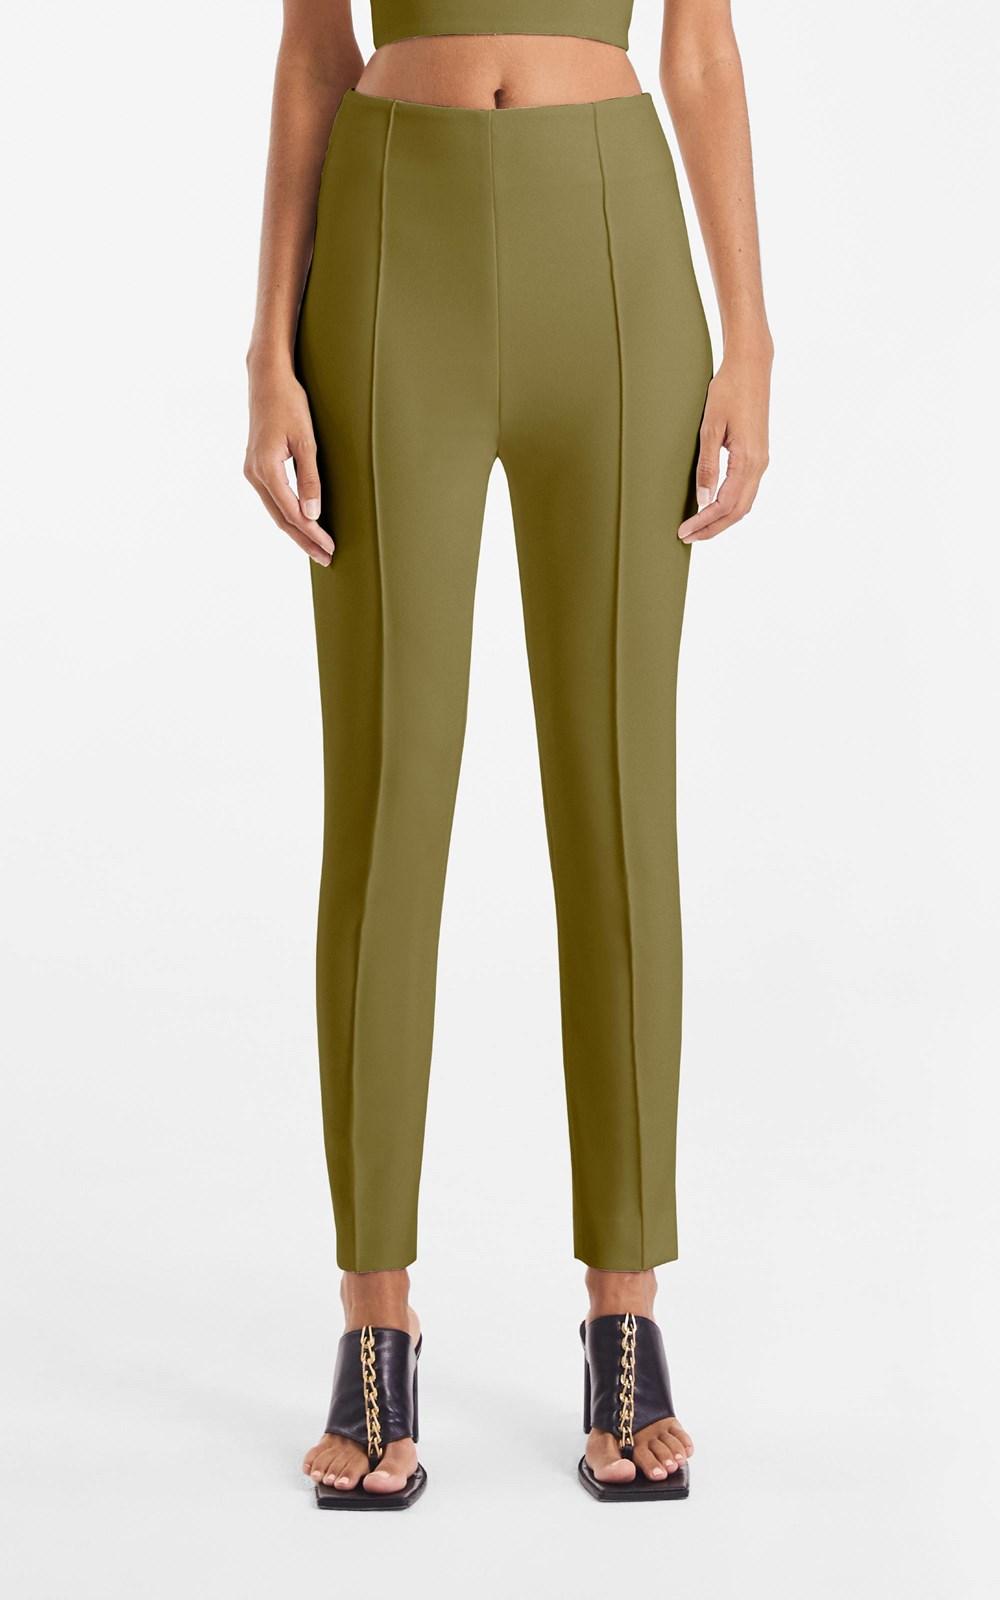 Pants | SINGLE STITCH TROUSER